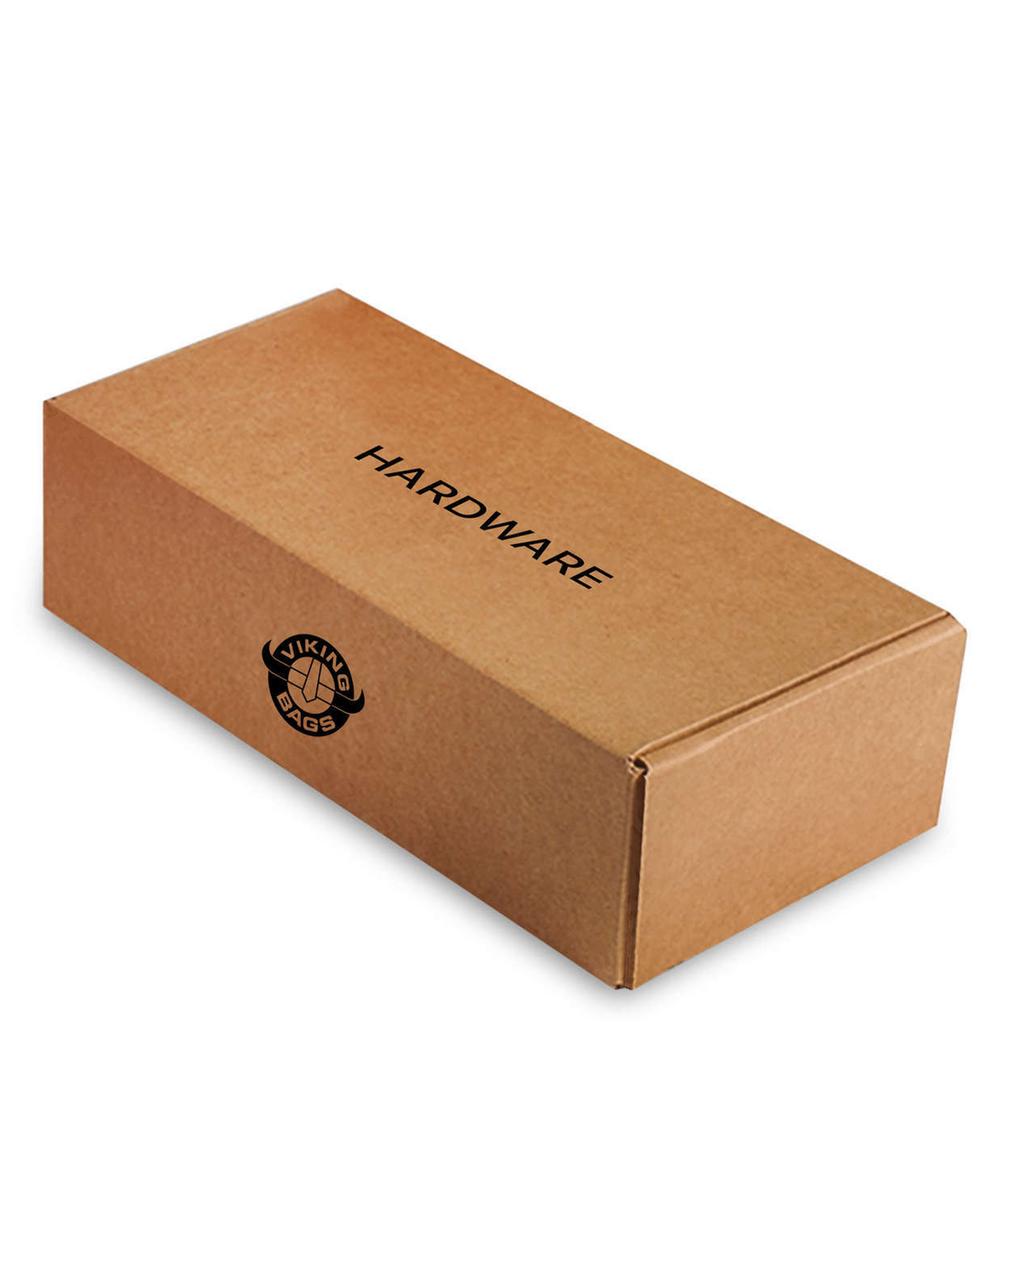 Honda 1100 Shadow Sabre Viking Lamellar Large Leather Covered Hard Saddlebags Box